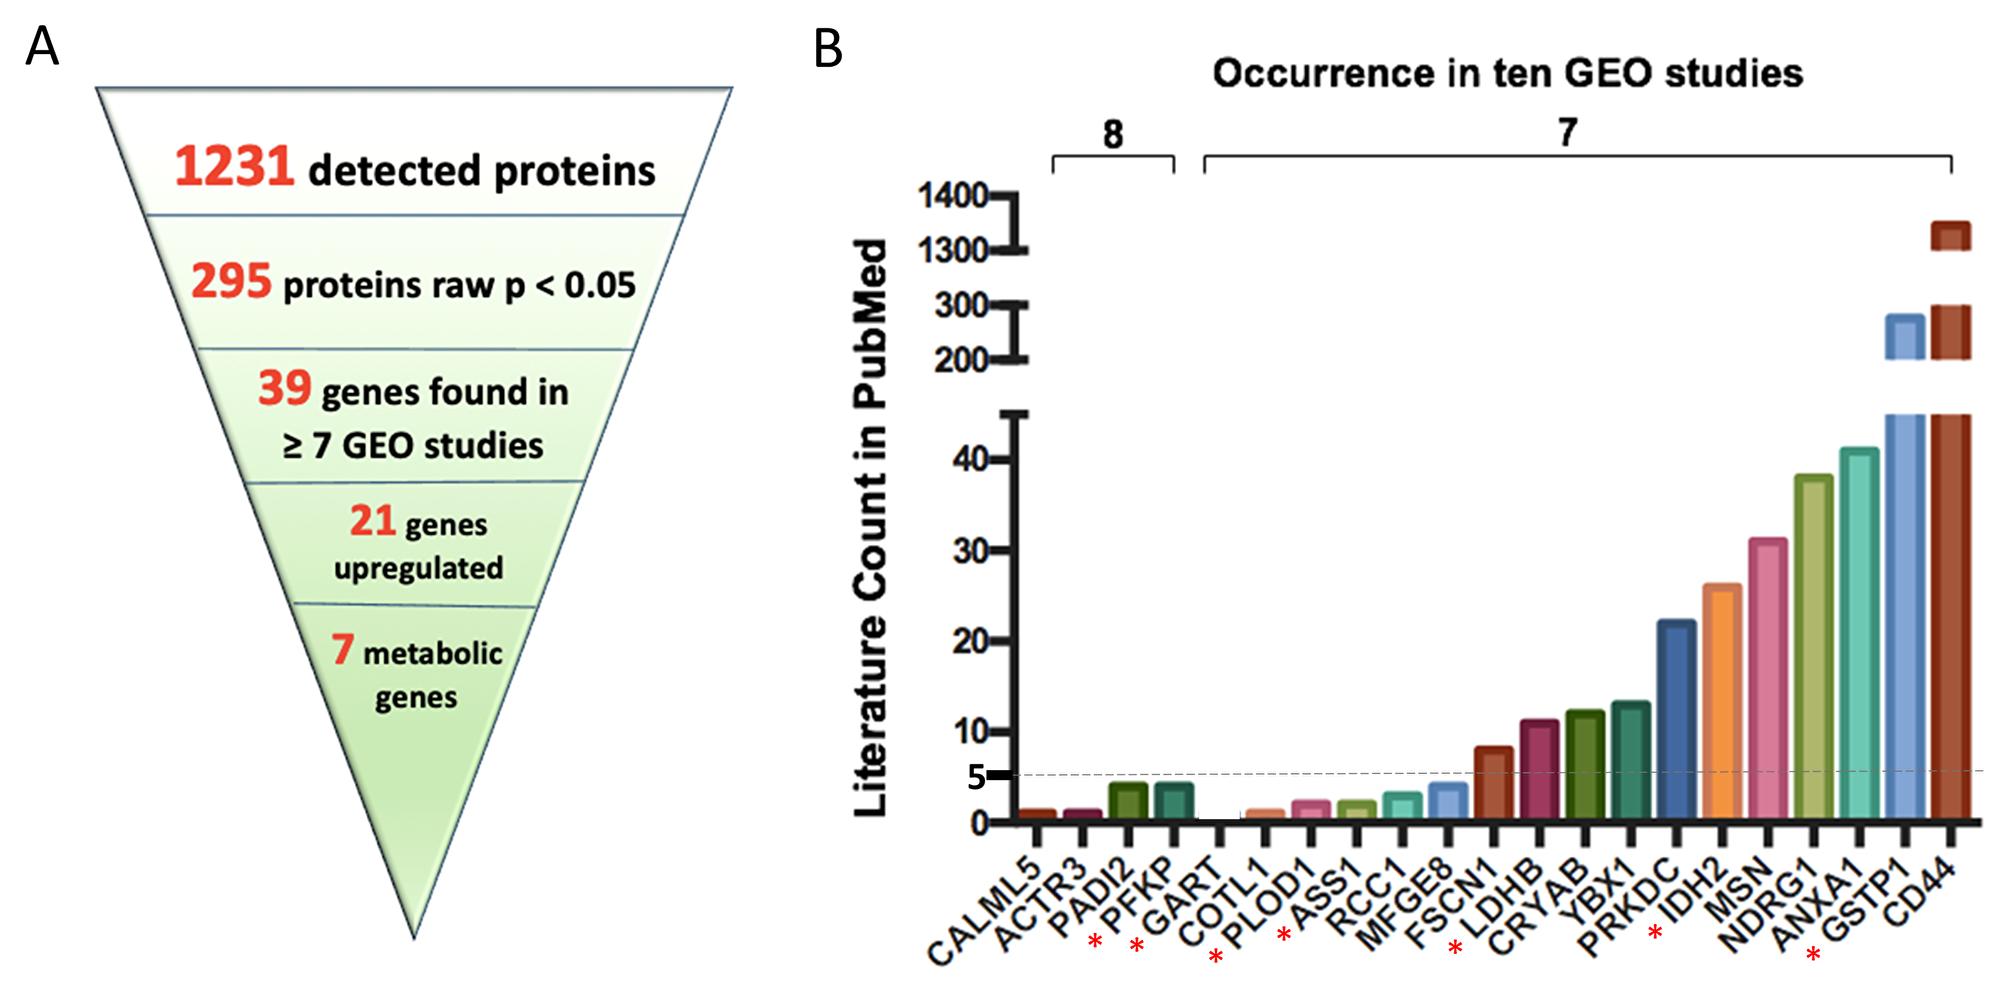 Key upregulated protein encoding genes most often found in ten GEO omnibus studies.